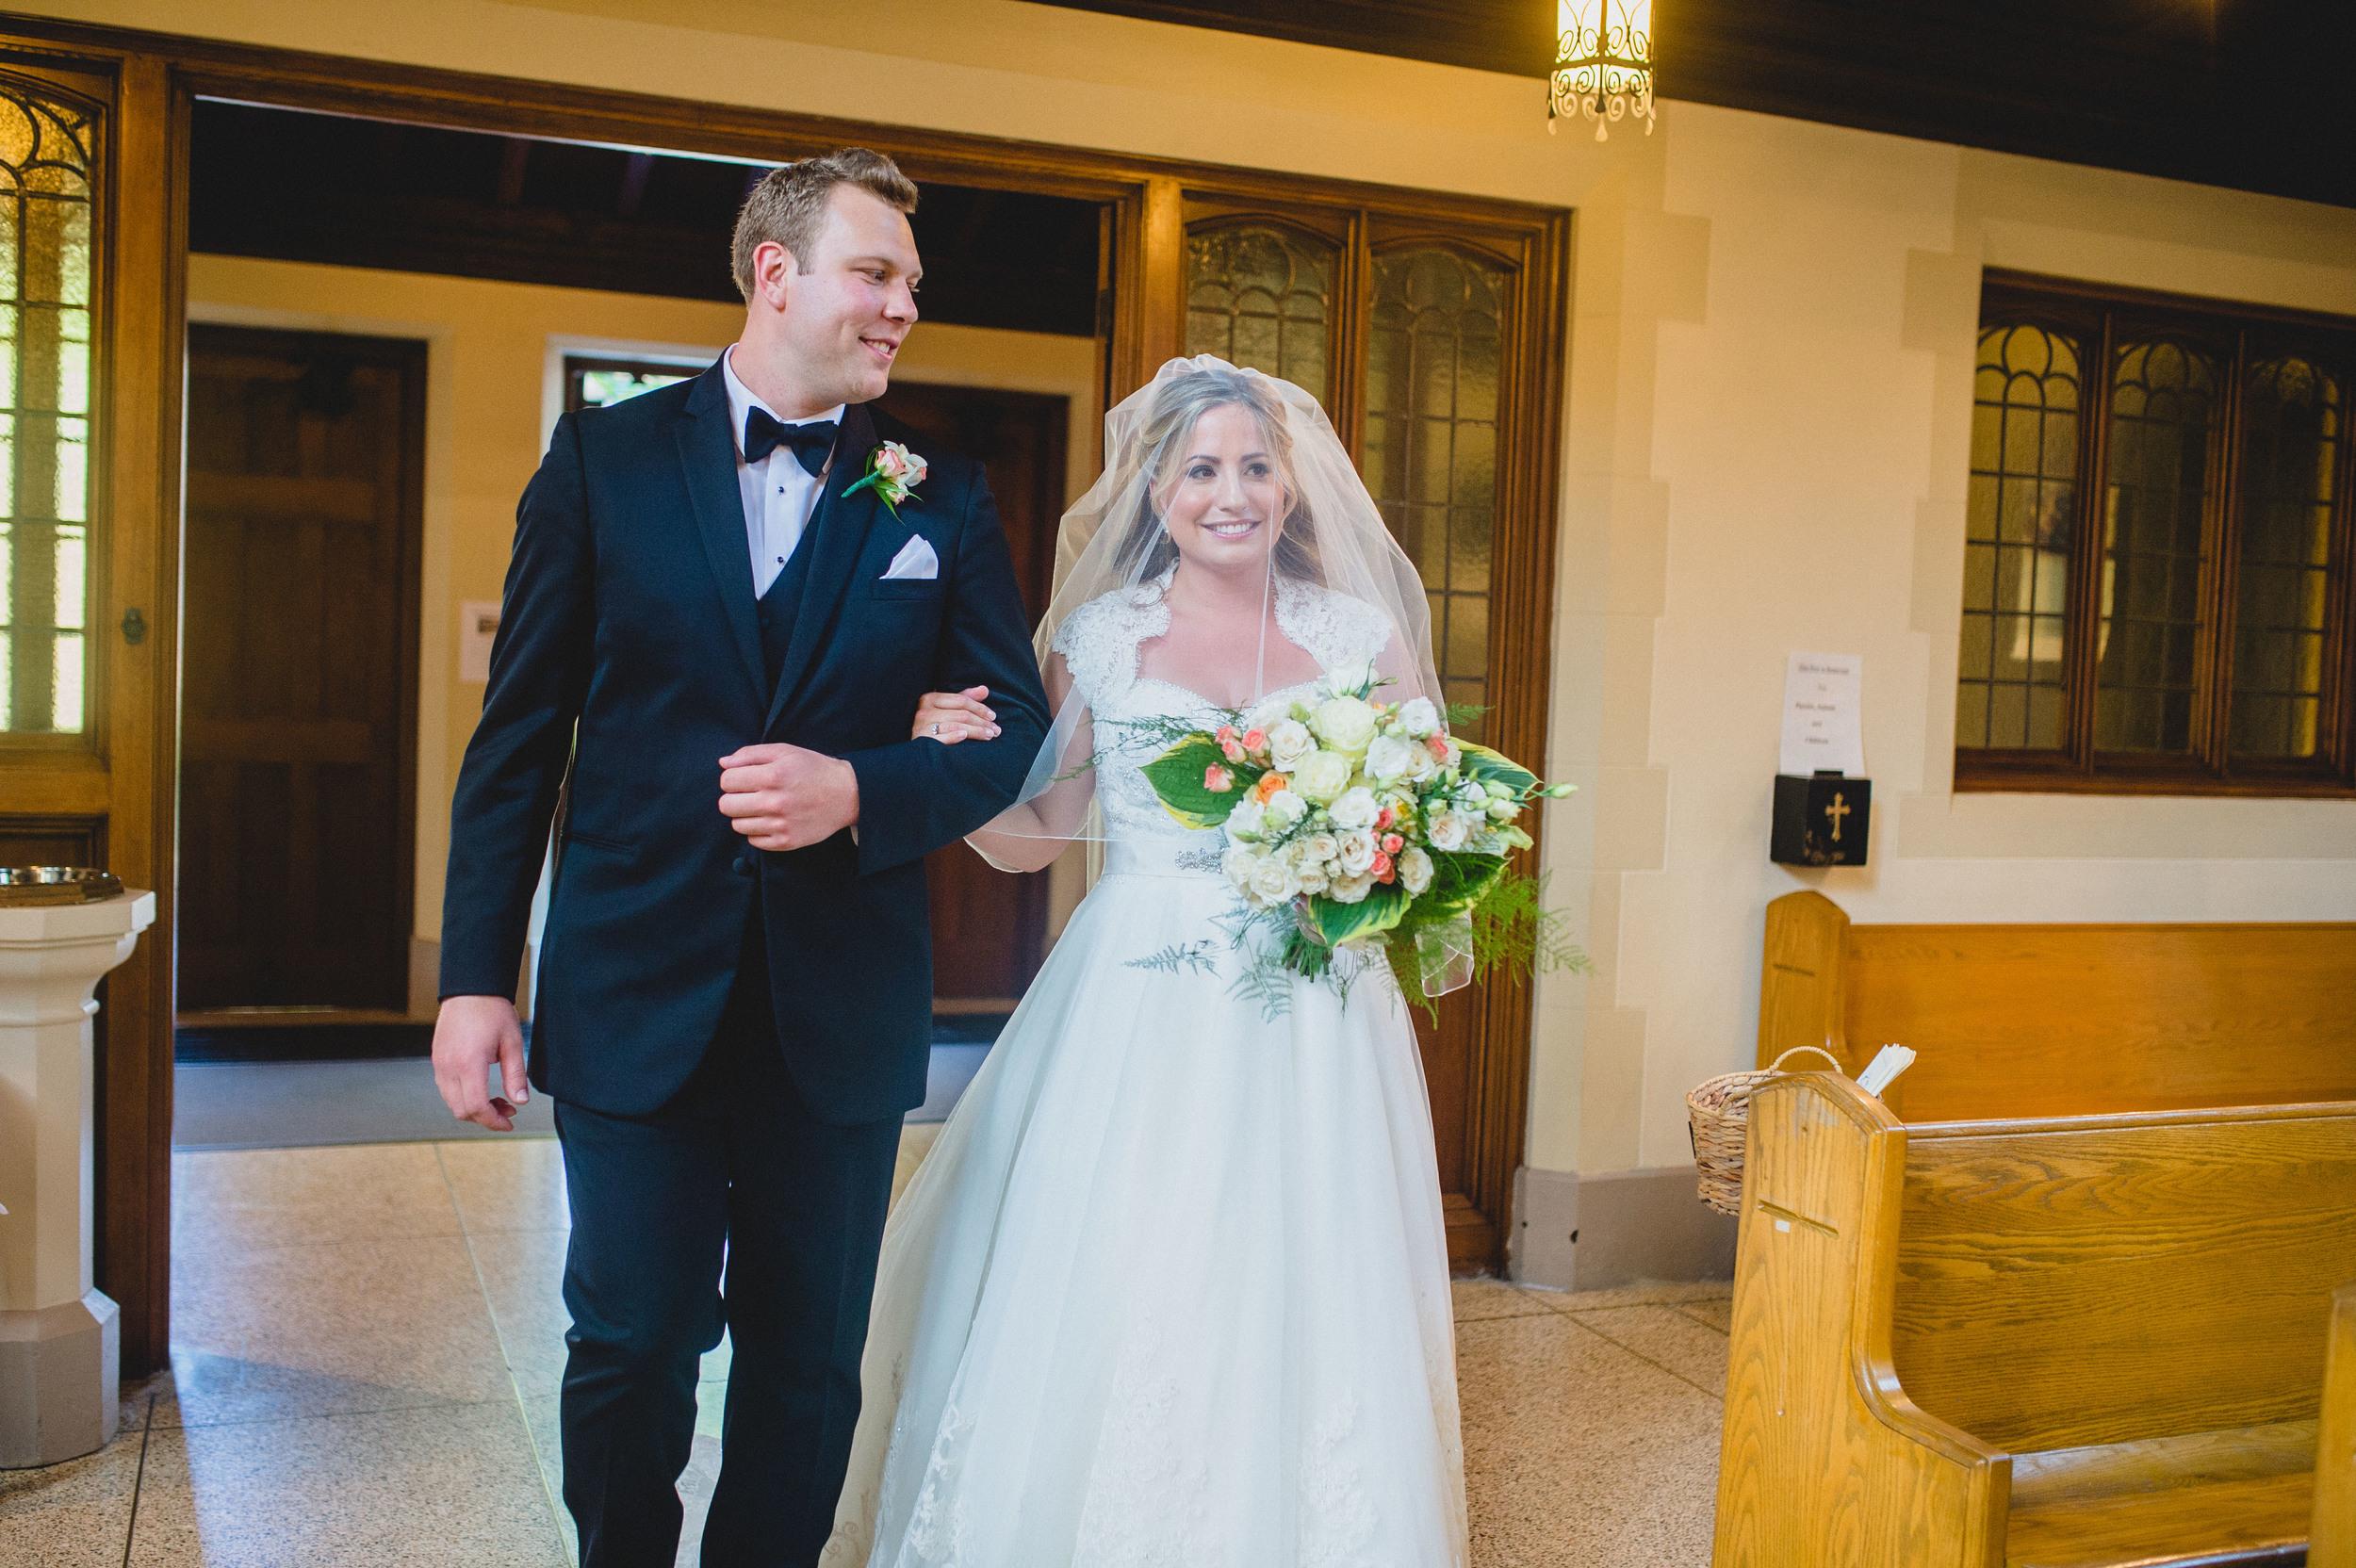 Vancouver St Augustine 's Church wedding photographer edward lai photography-33.jpg